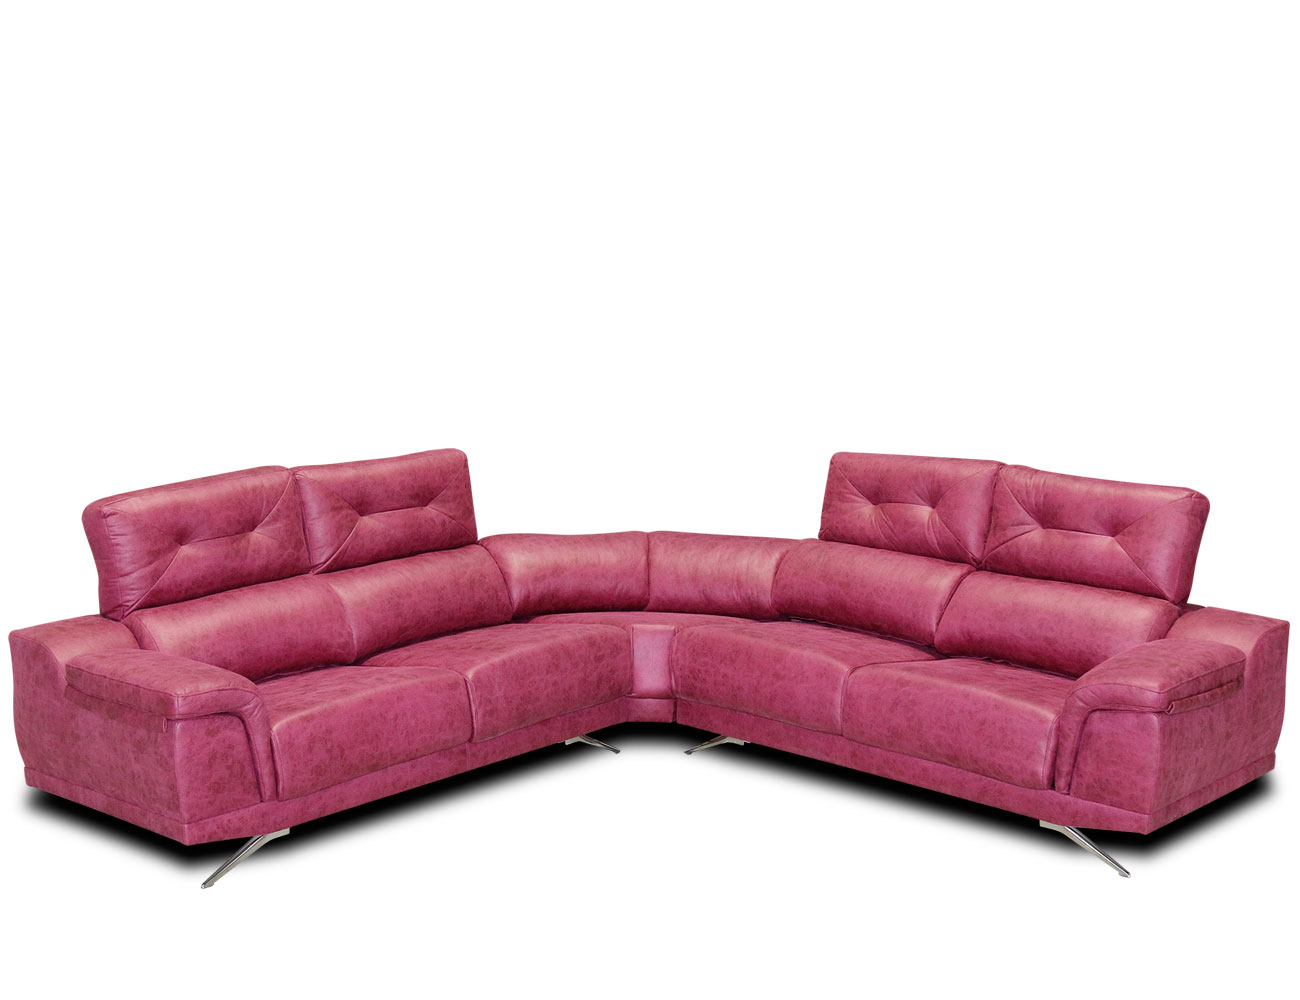 Sofa rinconera tejido antimanchas fucsia rosa 1